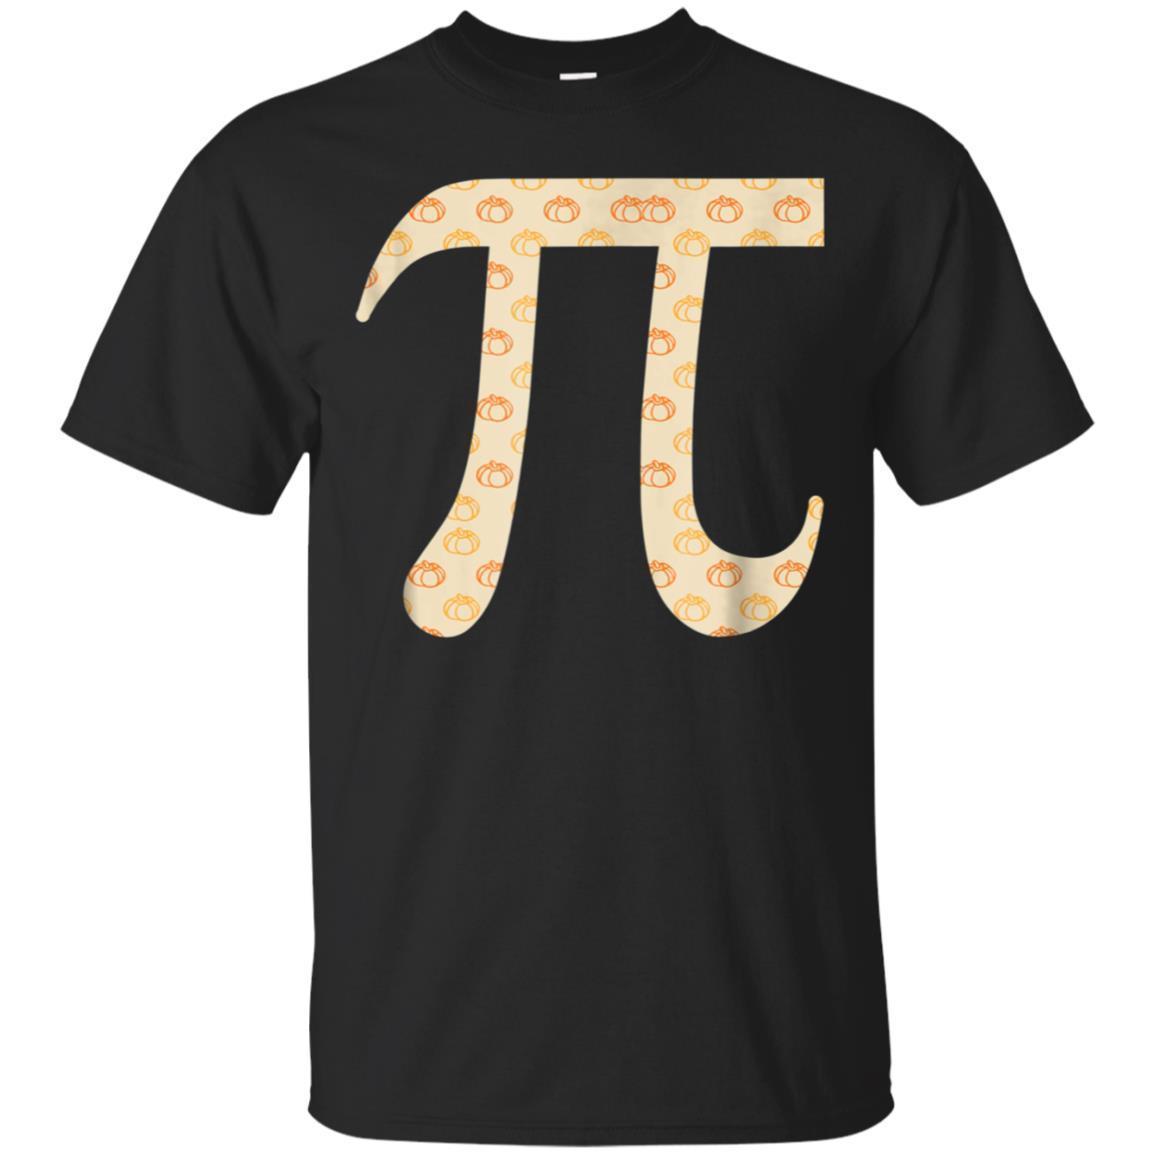 Find Pumpkin Pie Funny Pi Geometry Math Pun Shirts